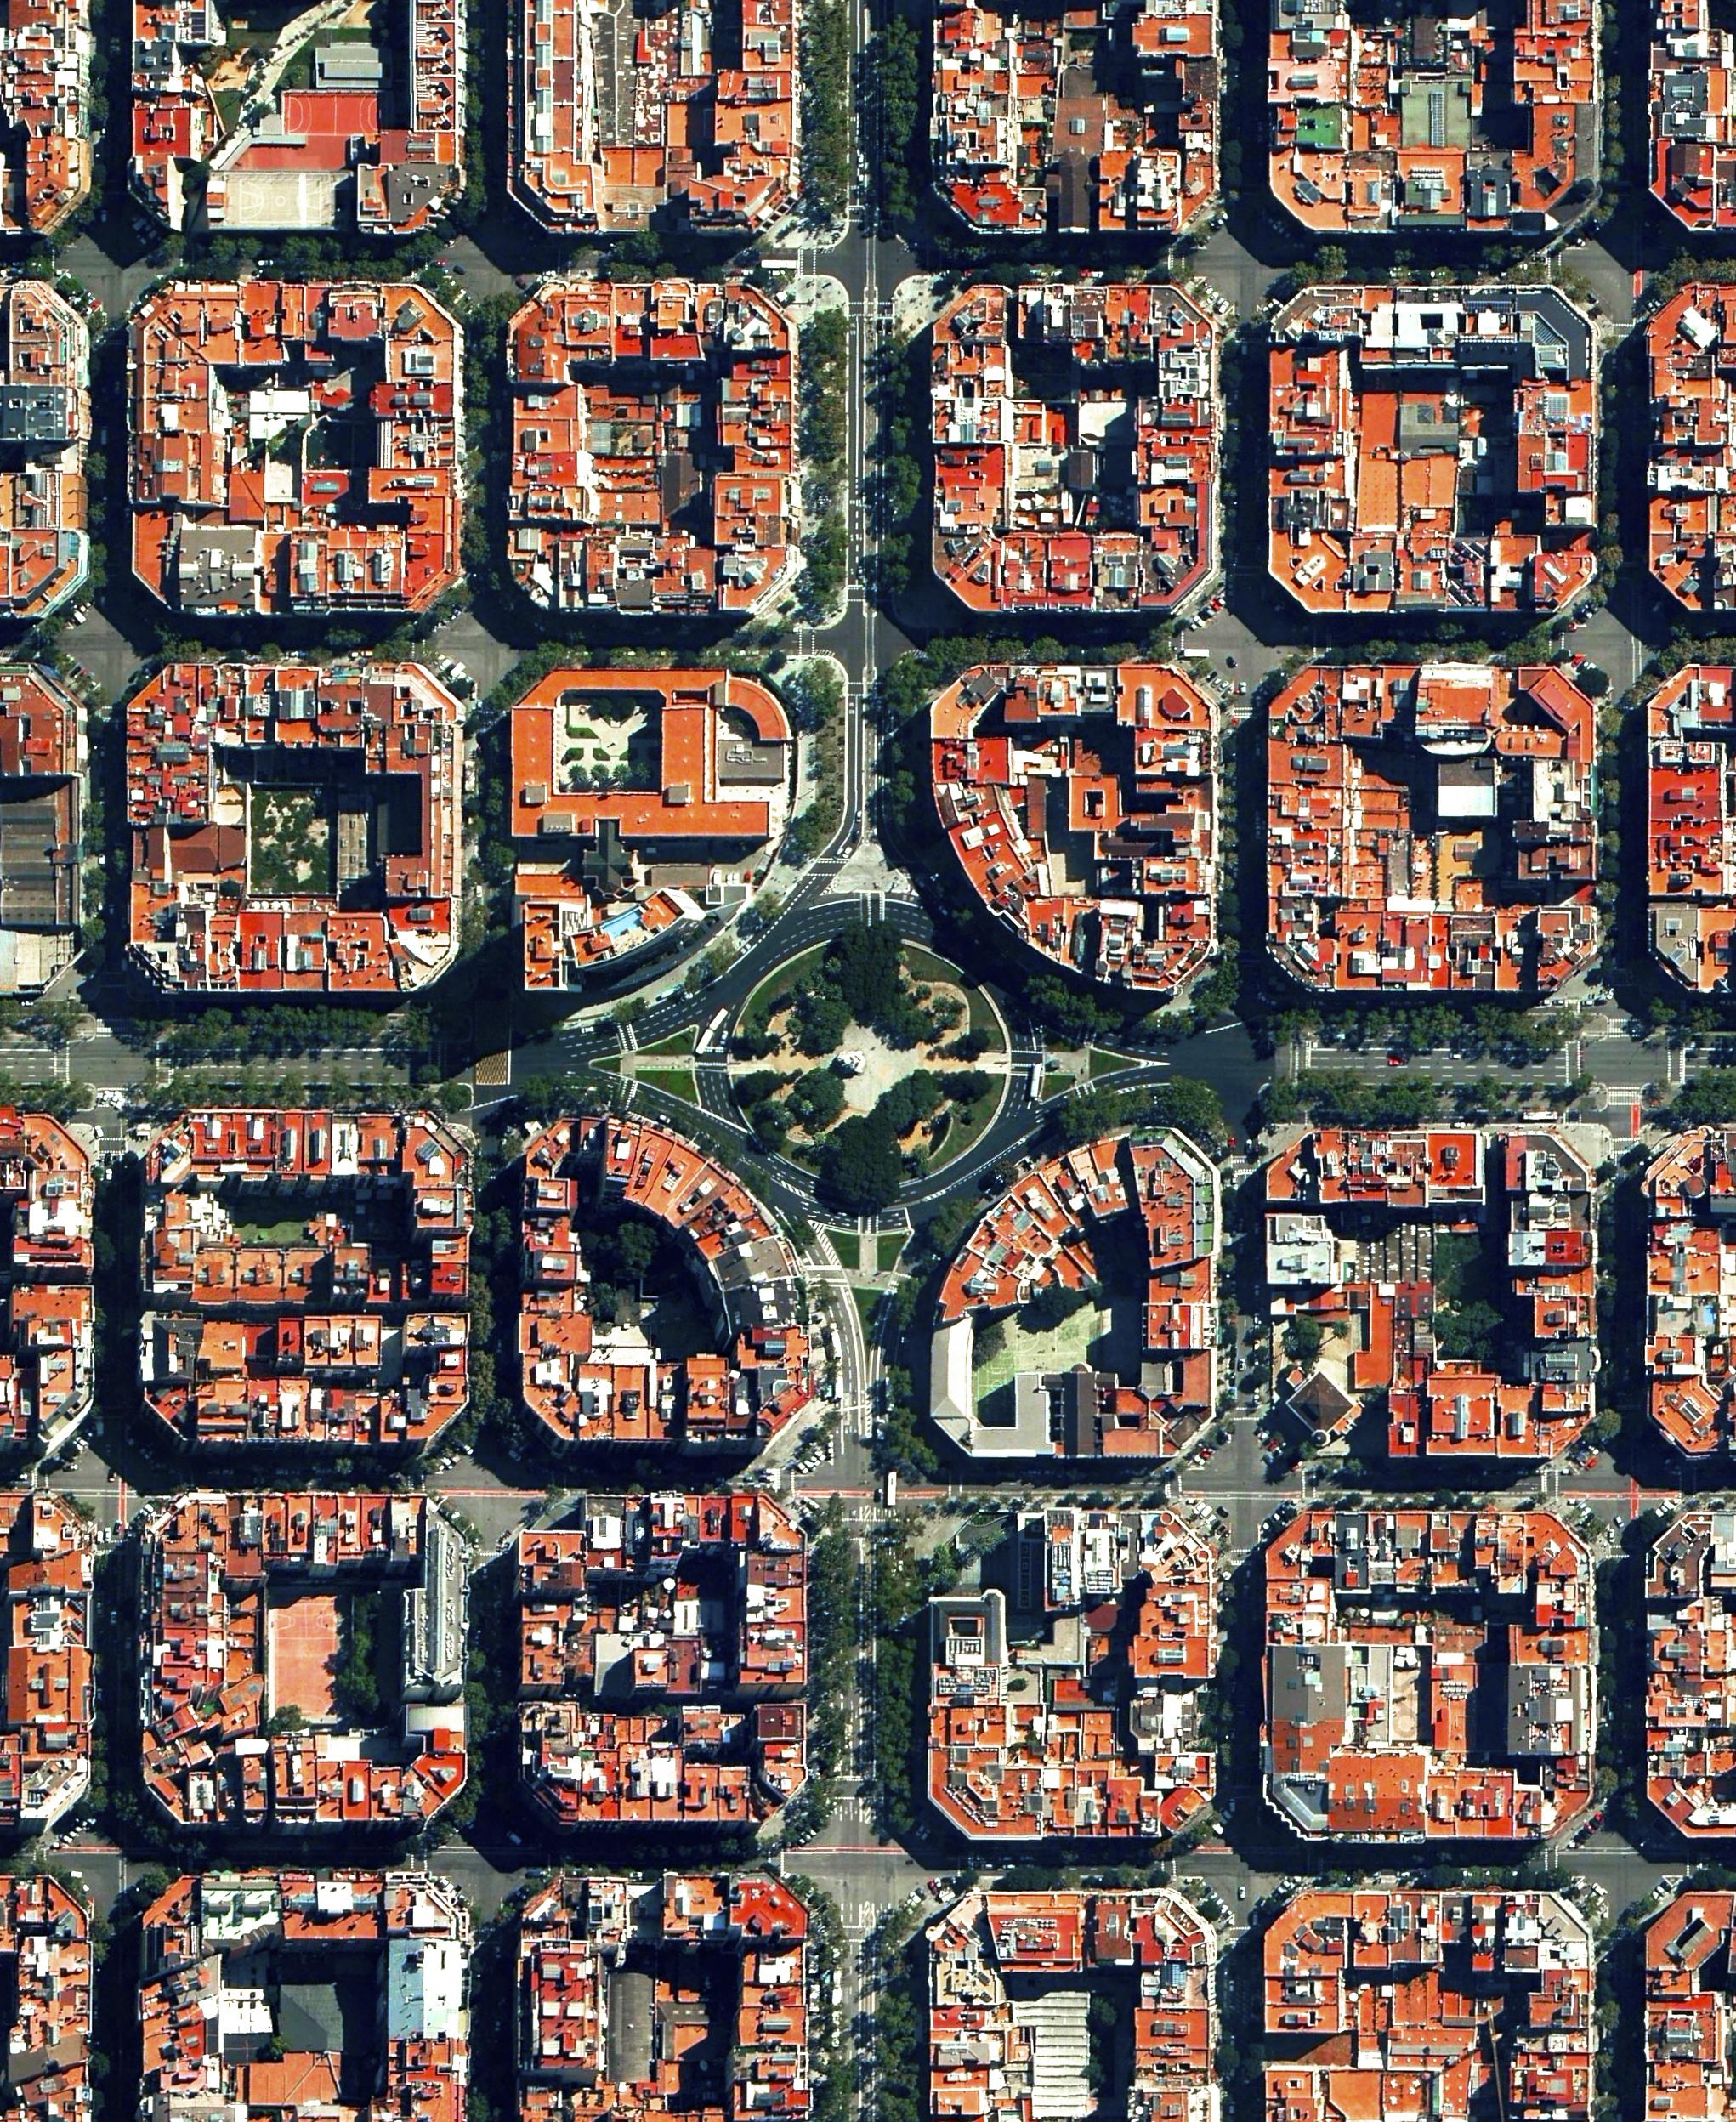 2/19/2016  Plaça de Tetuan  Eixample District, Barcelona, Spain  41.394921°N 2.175507°E     Plaça de Tetuan is a major square located in the Eixample district of Barcelona, Spain. The area characterized by its strict grid pattern, octagonal intersections, and apartments with communal courtyards.